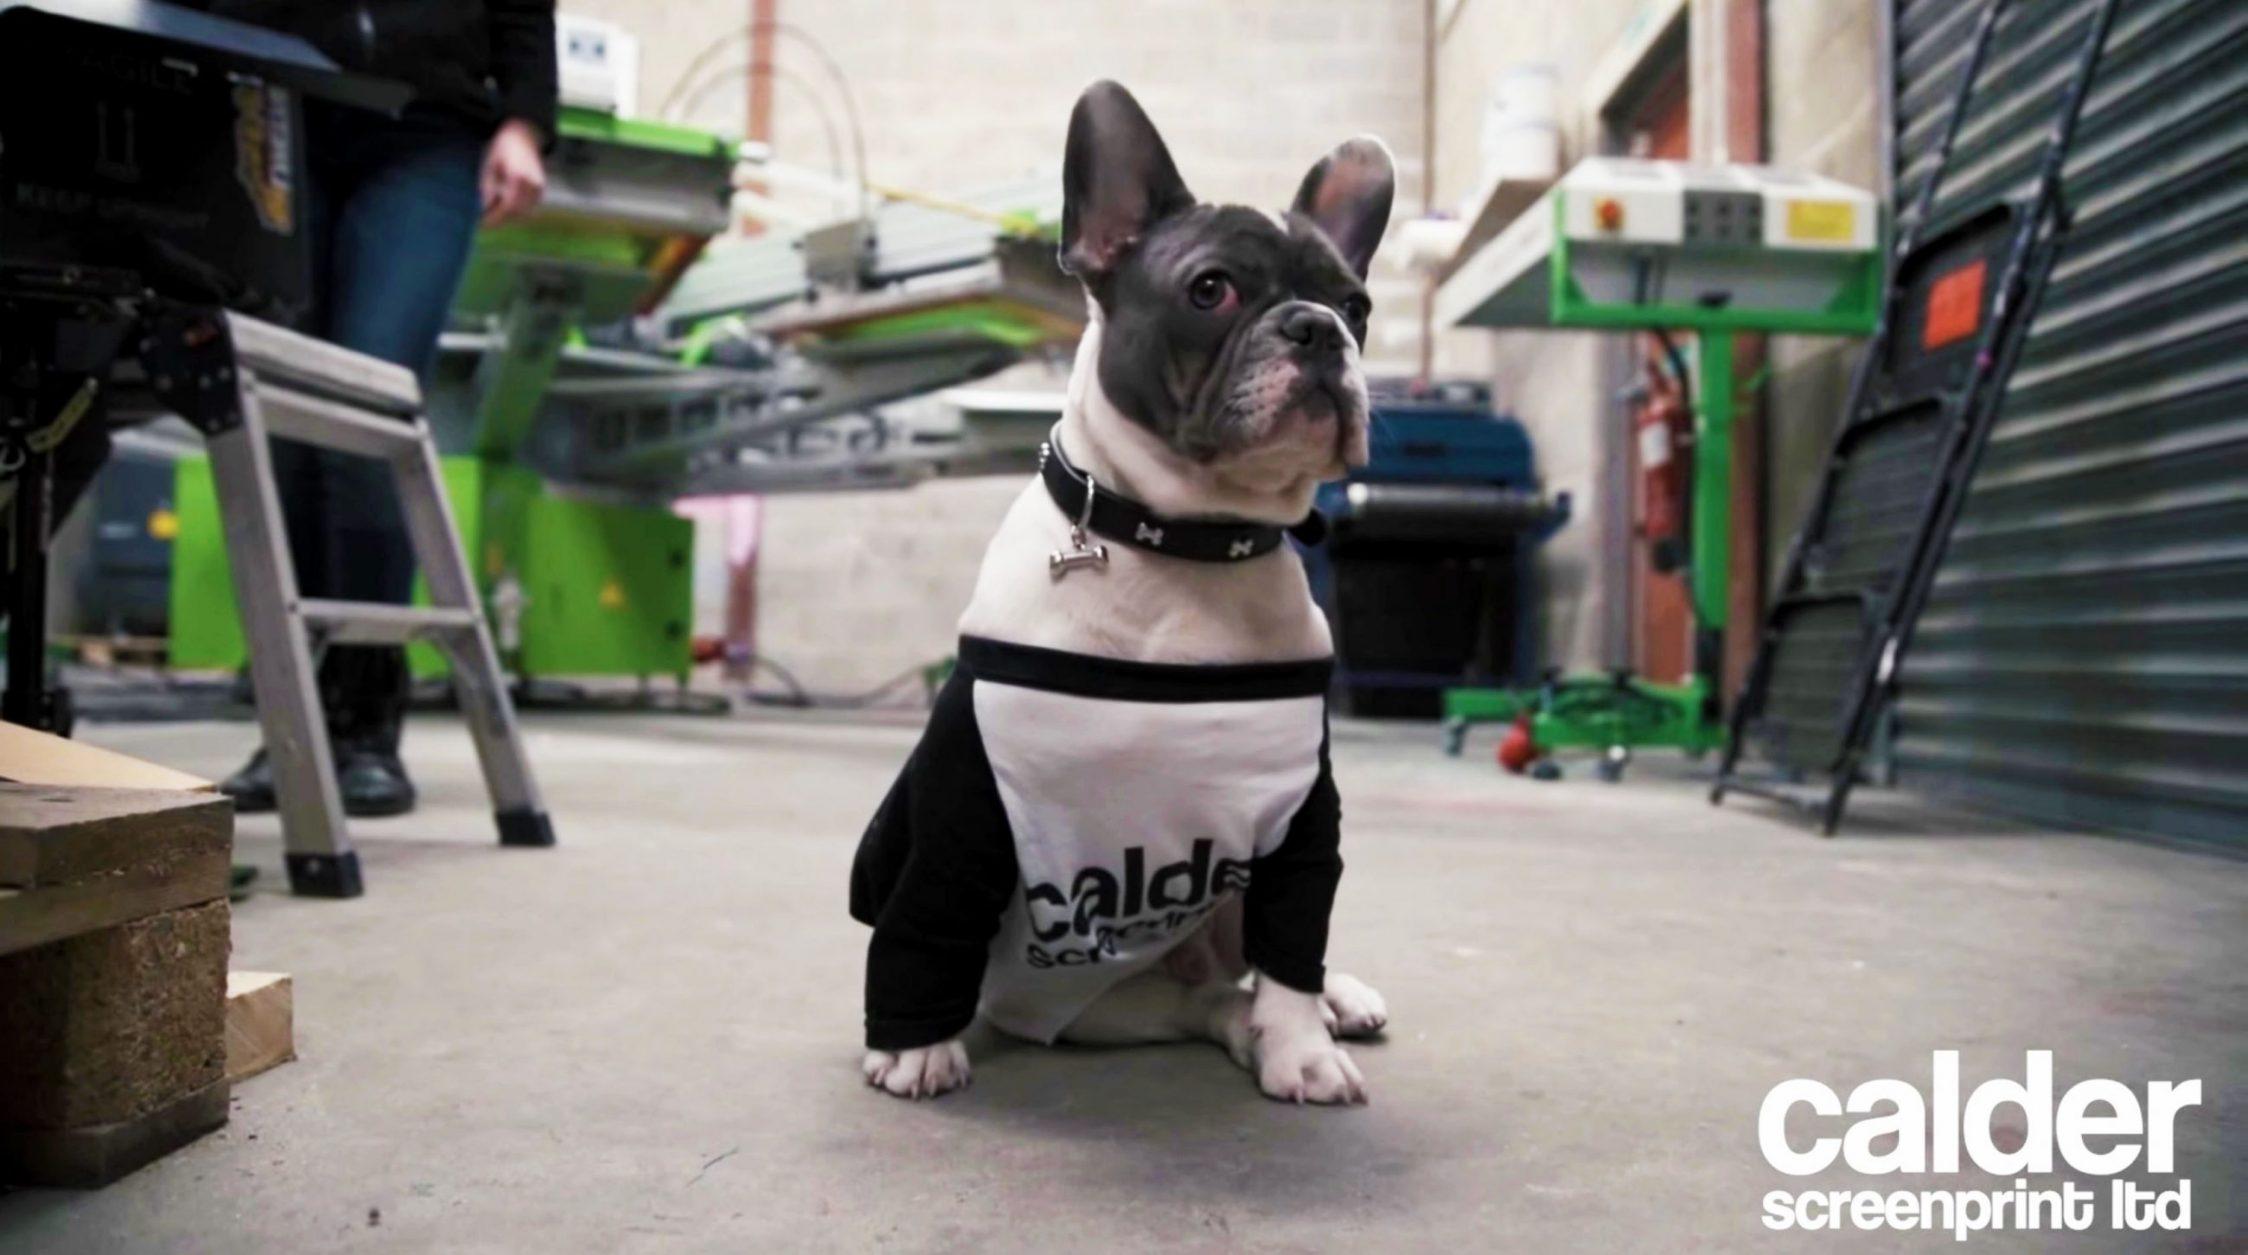 dog1 - Web design for screen printing company